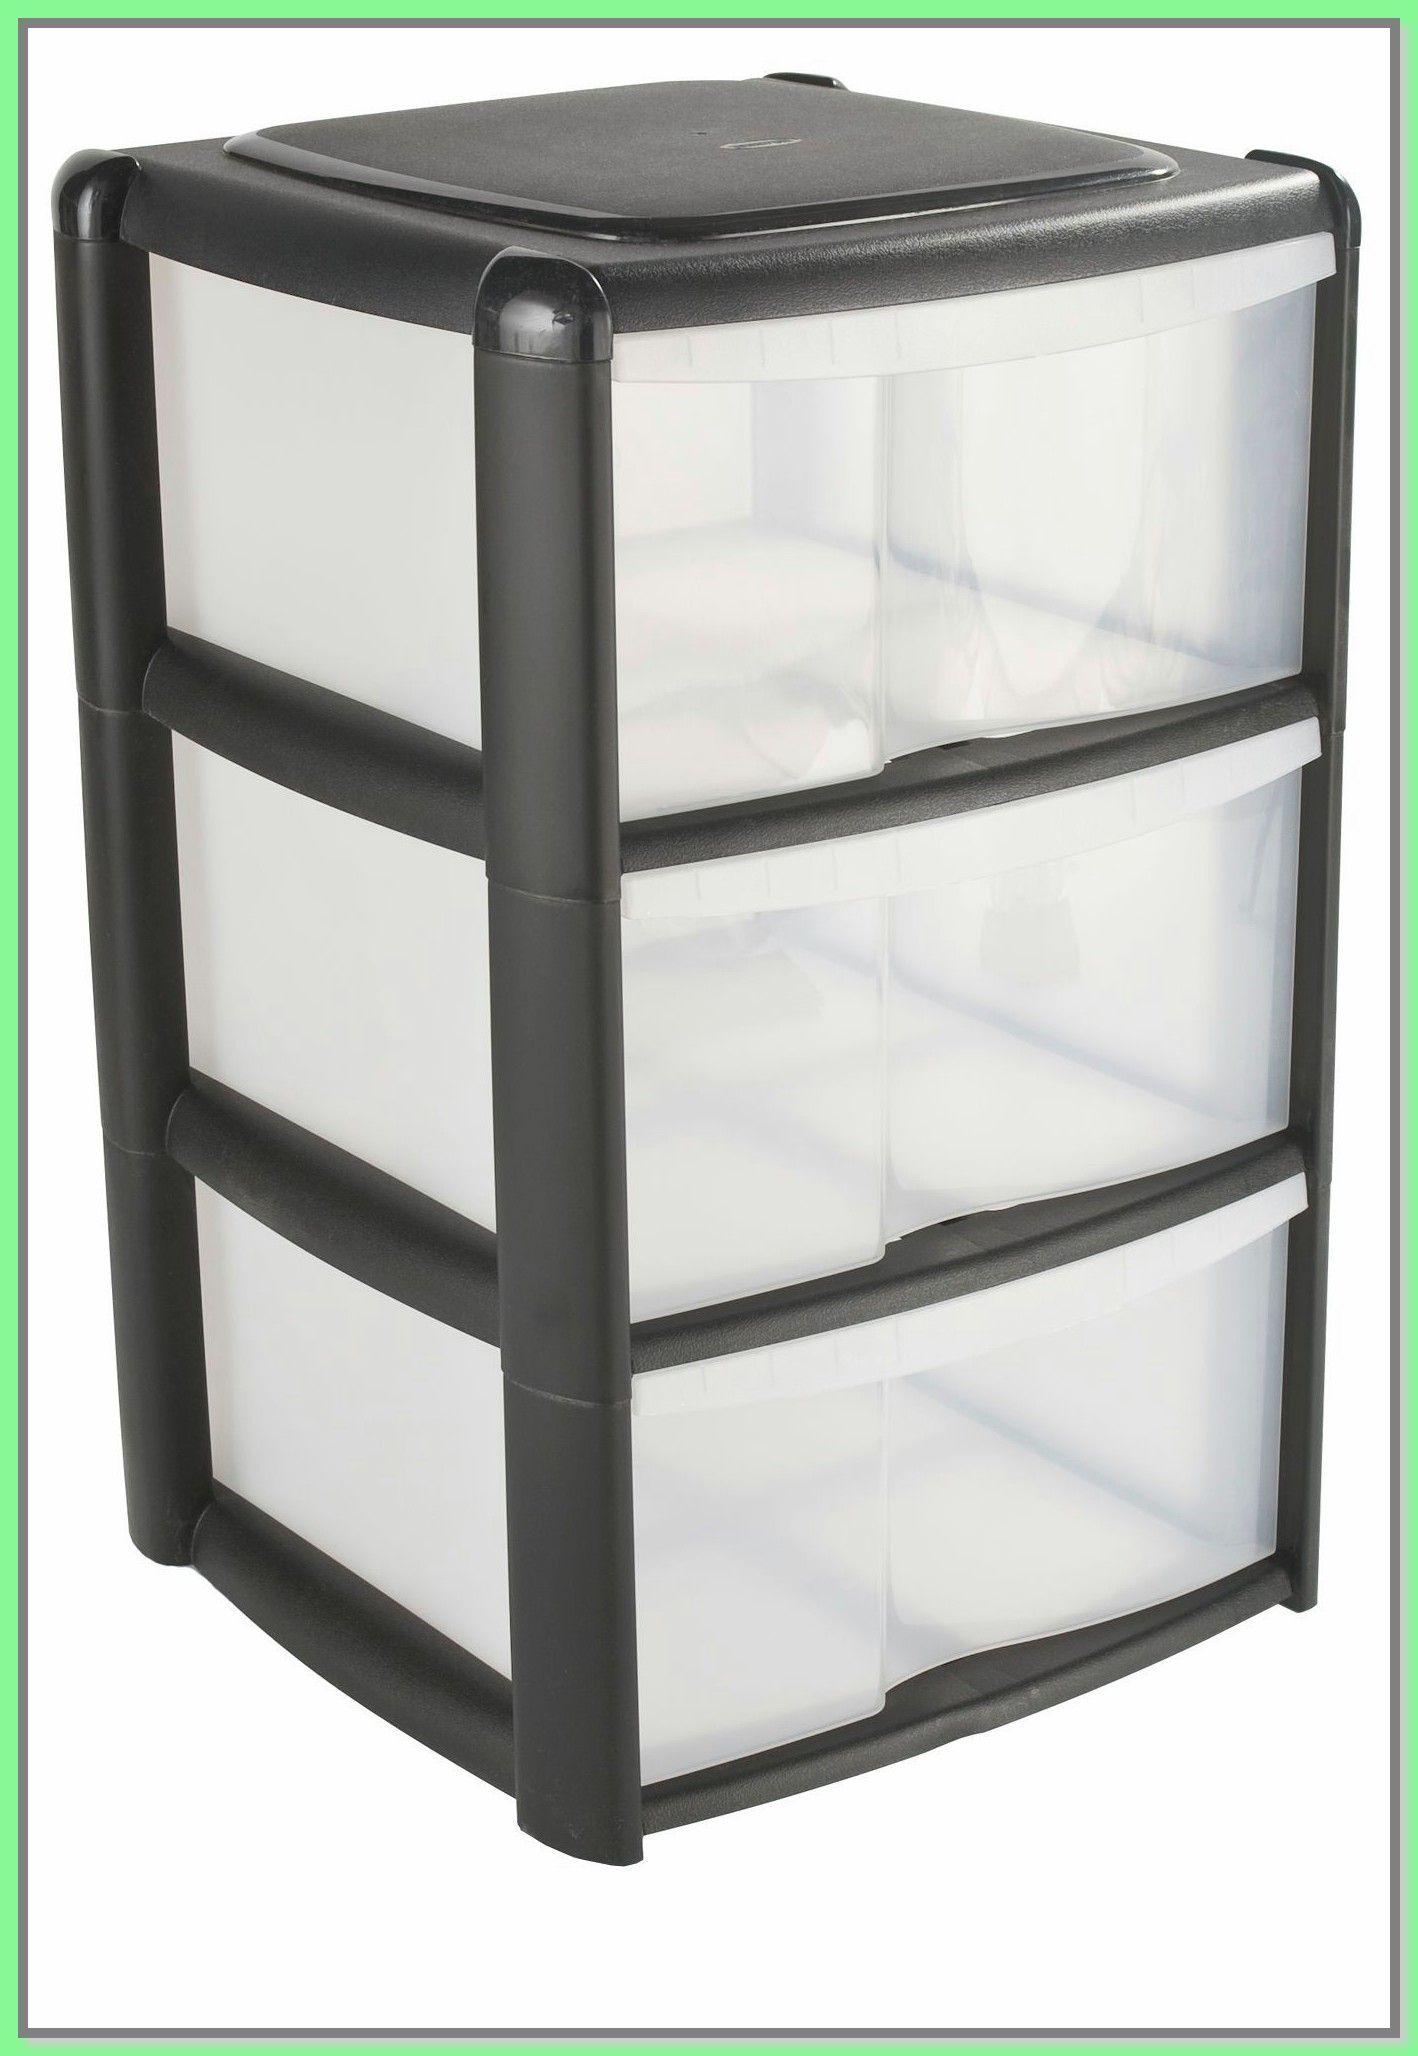 3 Plastic Drawer Black Storage Unit 3 Plastic Drawer Black Storage Unit Please Click Link To Find More Reference